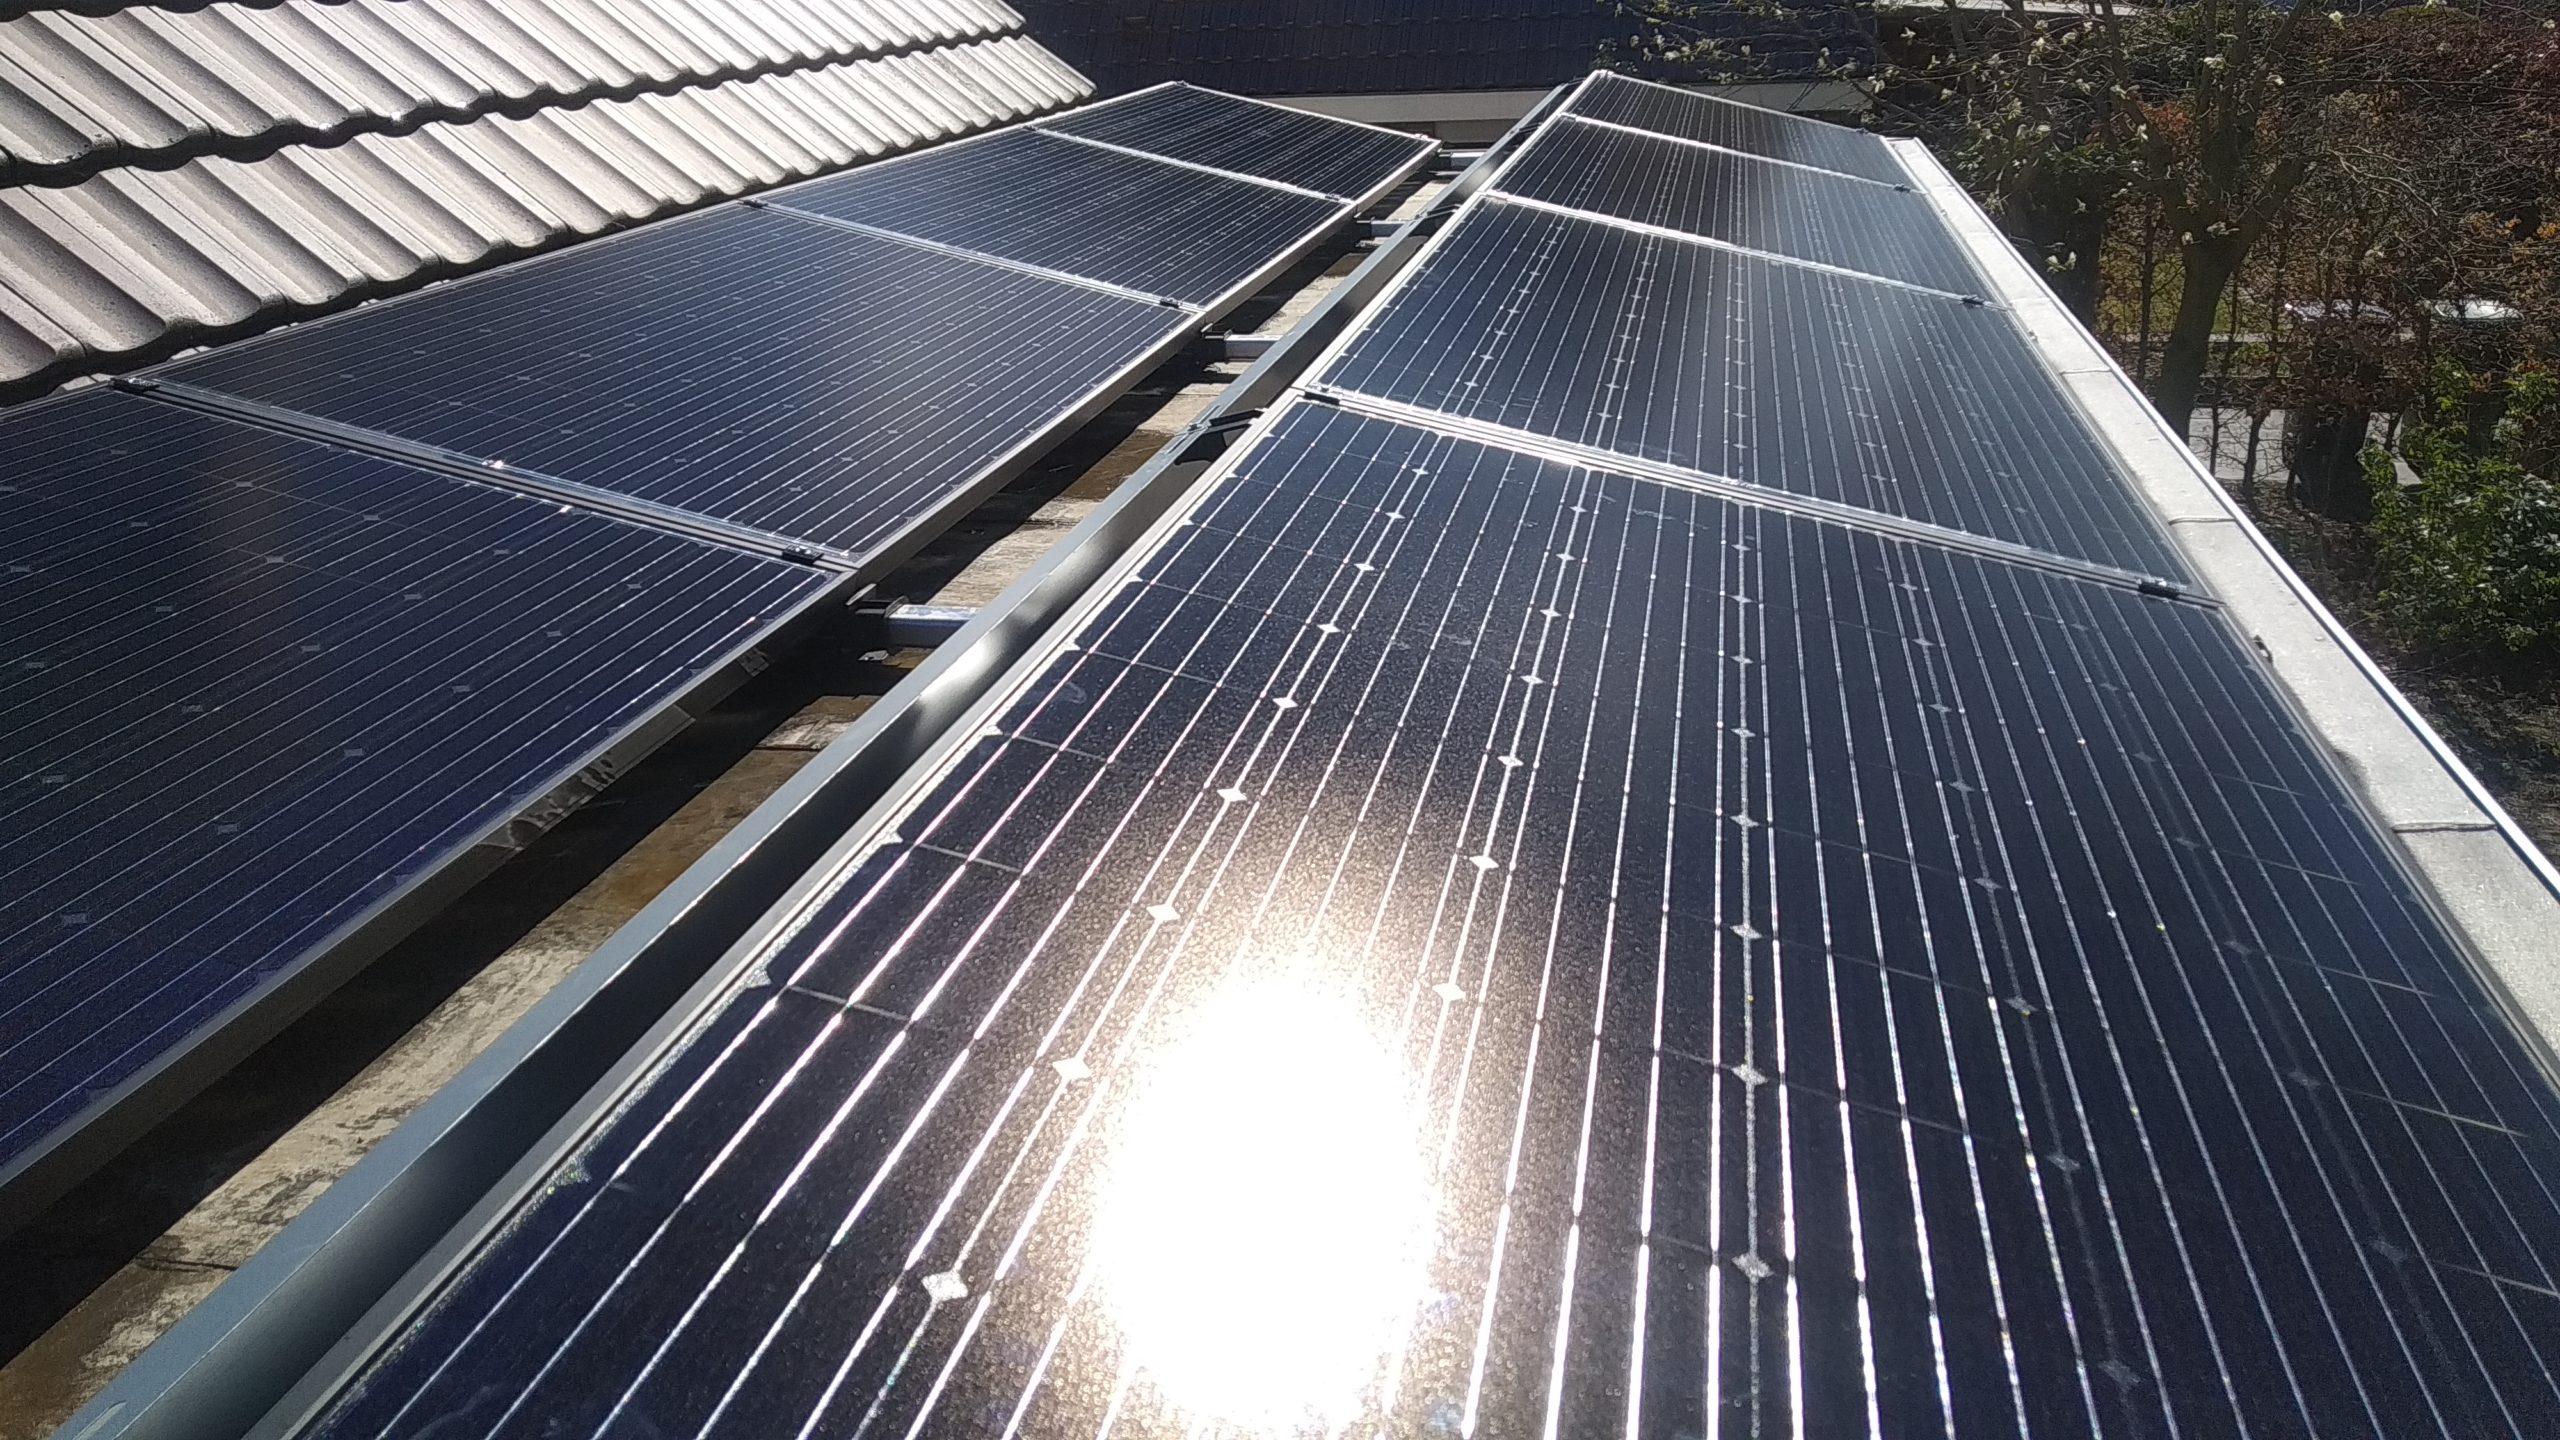 Solarwatt glas-glas zonnepanelen en flatfix fusion Hoogeveen